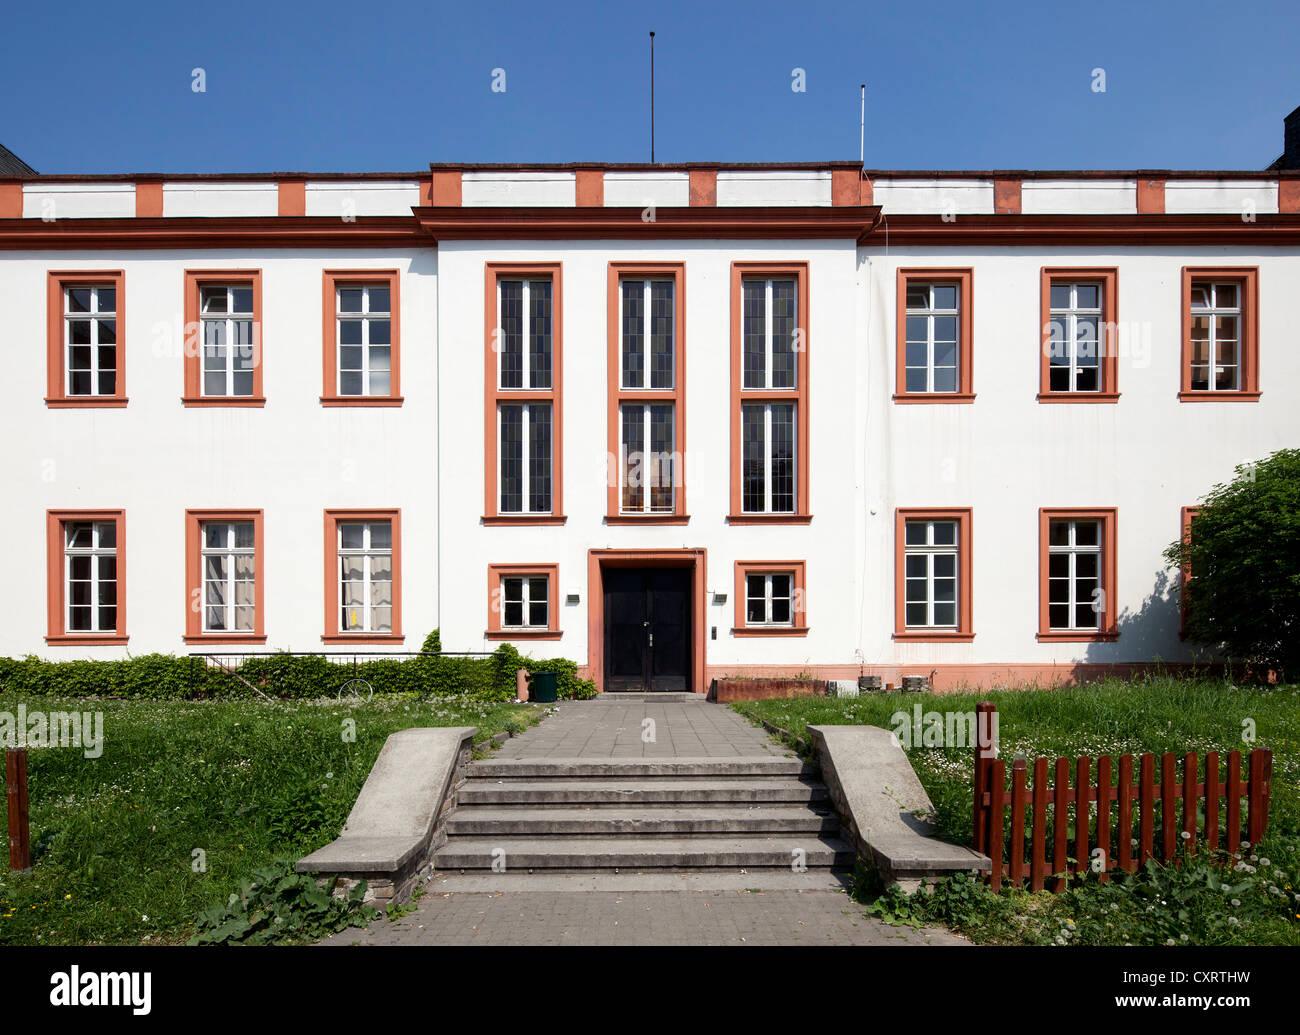 Former Schoenborner Hof, French Study Center, French Institute, Maison de France, Mainz, Rhineland-Palatinate, PublicGround - Stock Image